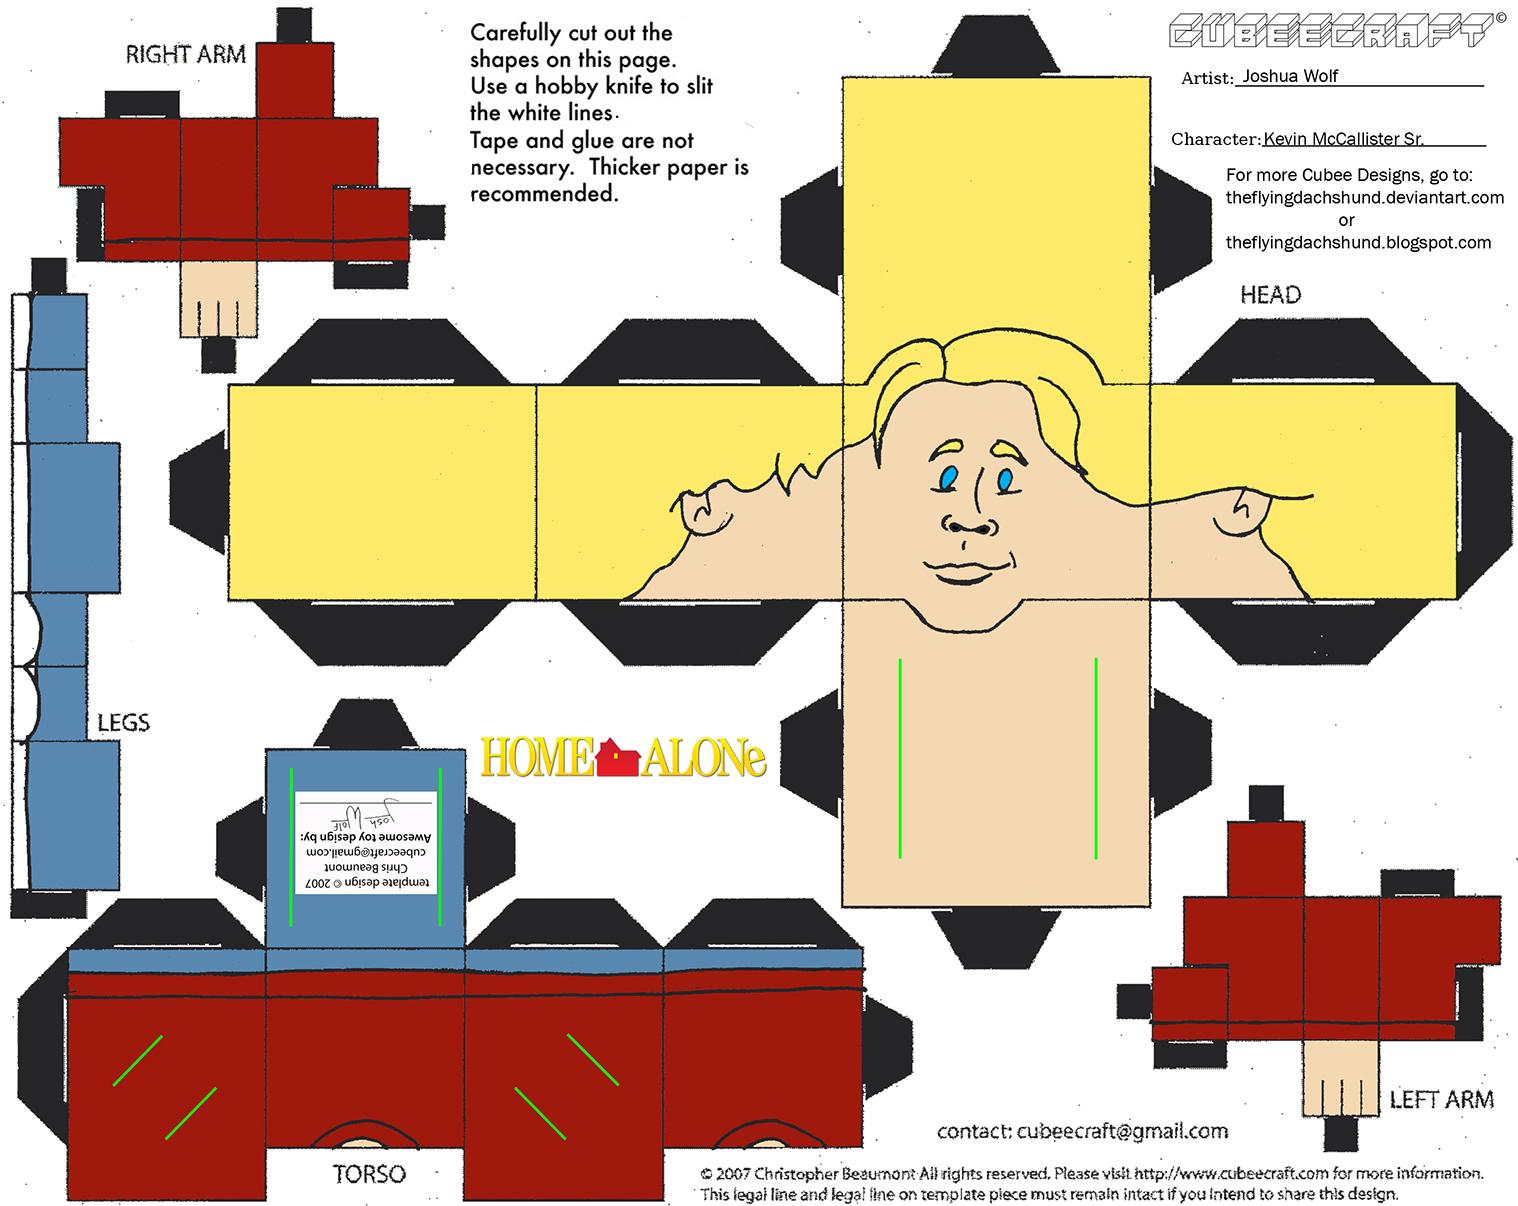 XMas12: Kevin McCallister Sr Cubee by TheFlyingDachshund